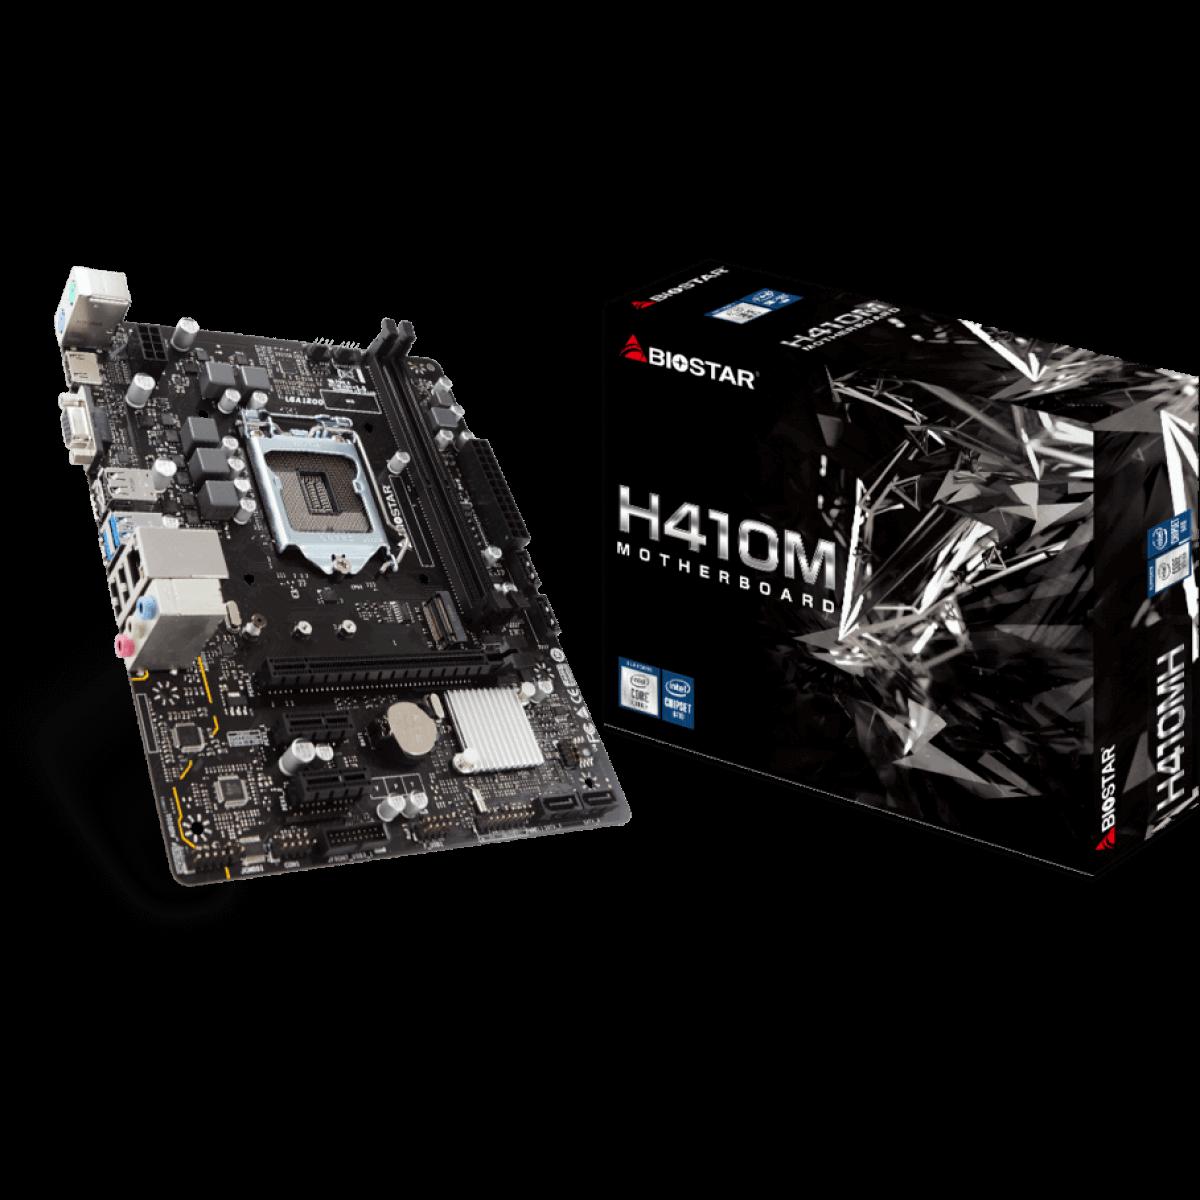 Placa Mãe Biostar H410MH VER 6.0 Chipset H410 Intel 1200 mATX DDR4